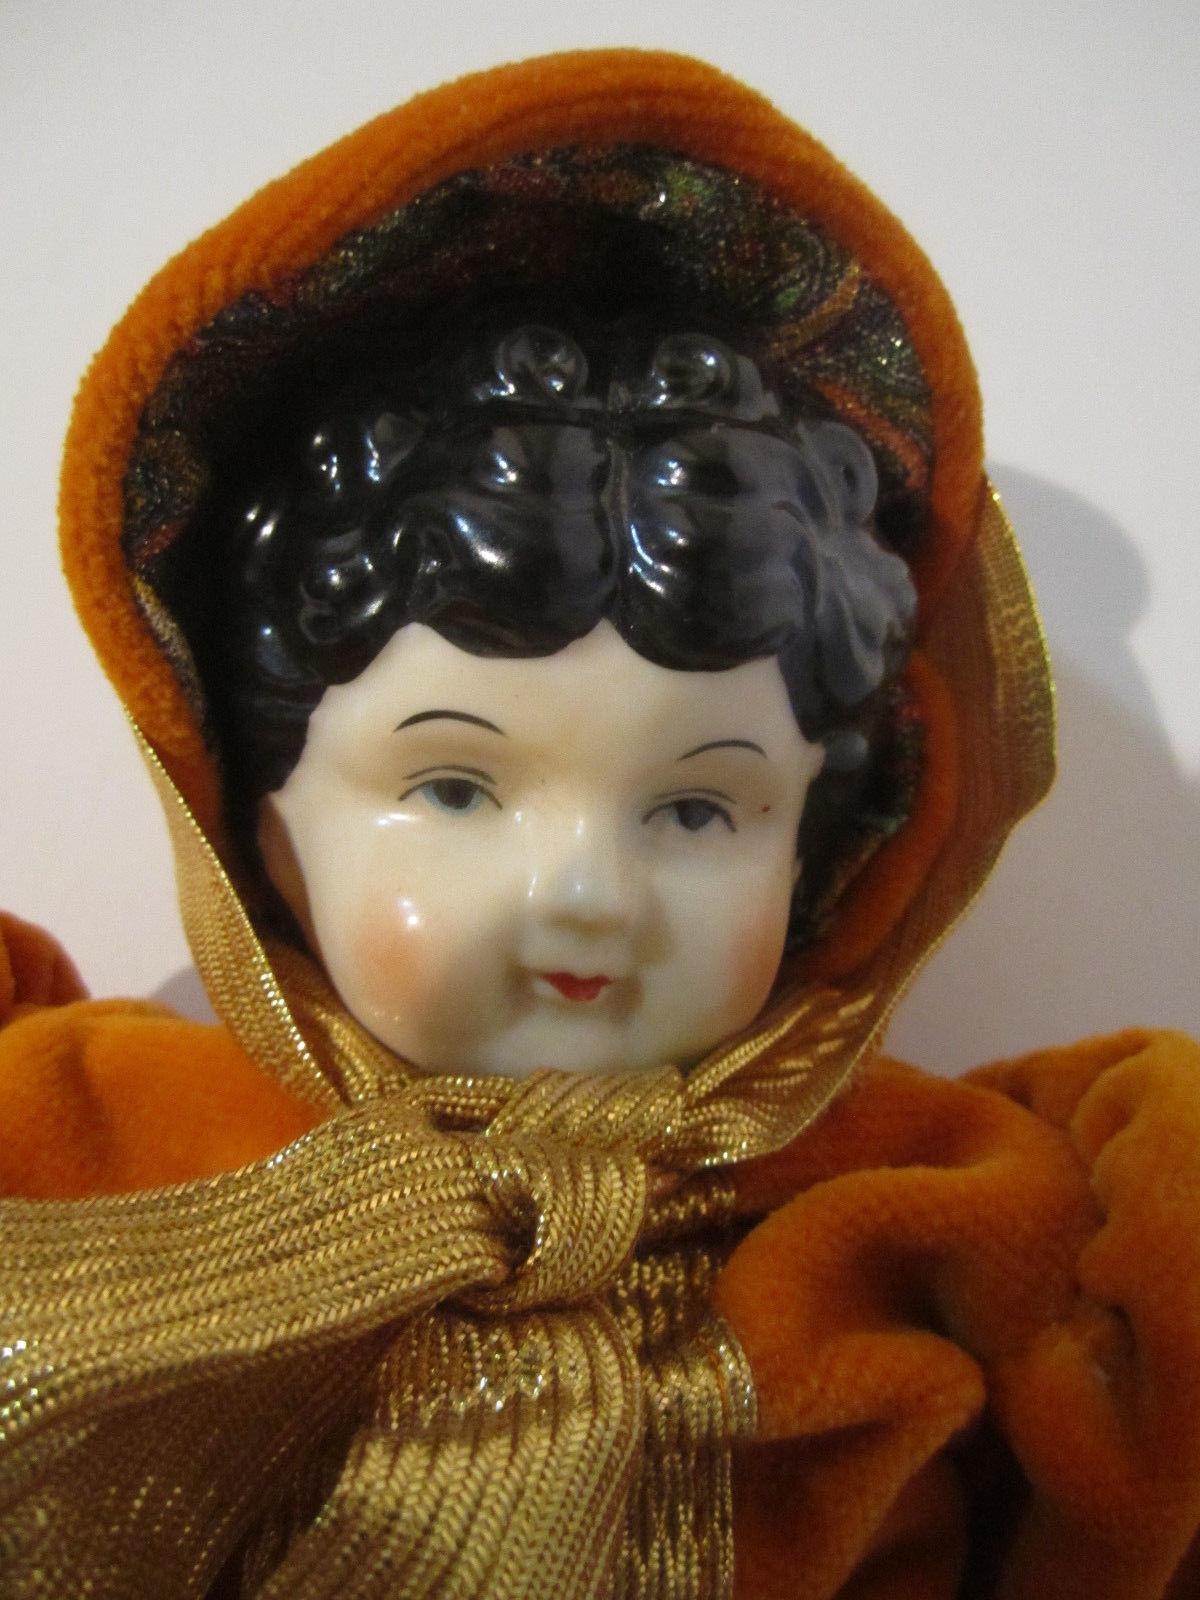 Elegant Repro Porcelain Brunette Doll Orange & Paisley Dress GORGEOUS! image 2